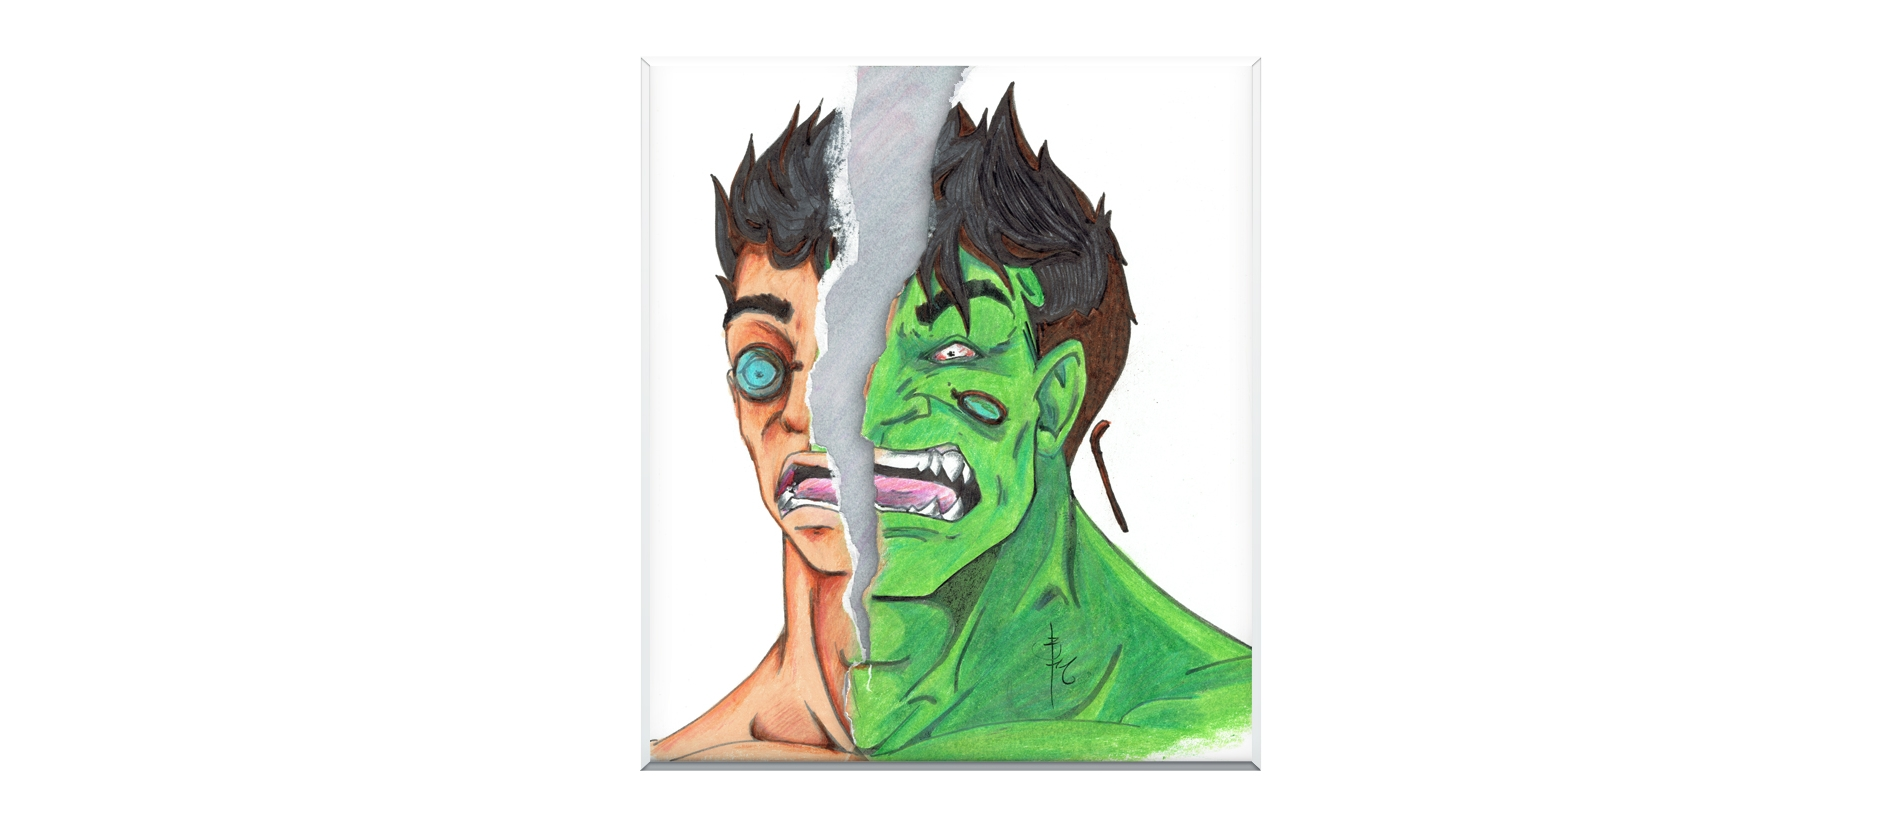 Transformation - Twilight Zone - Bono Mourits